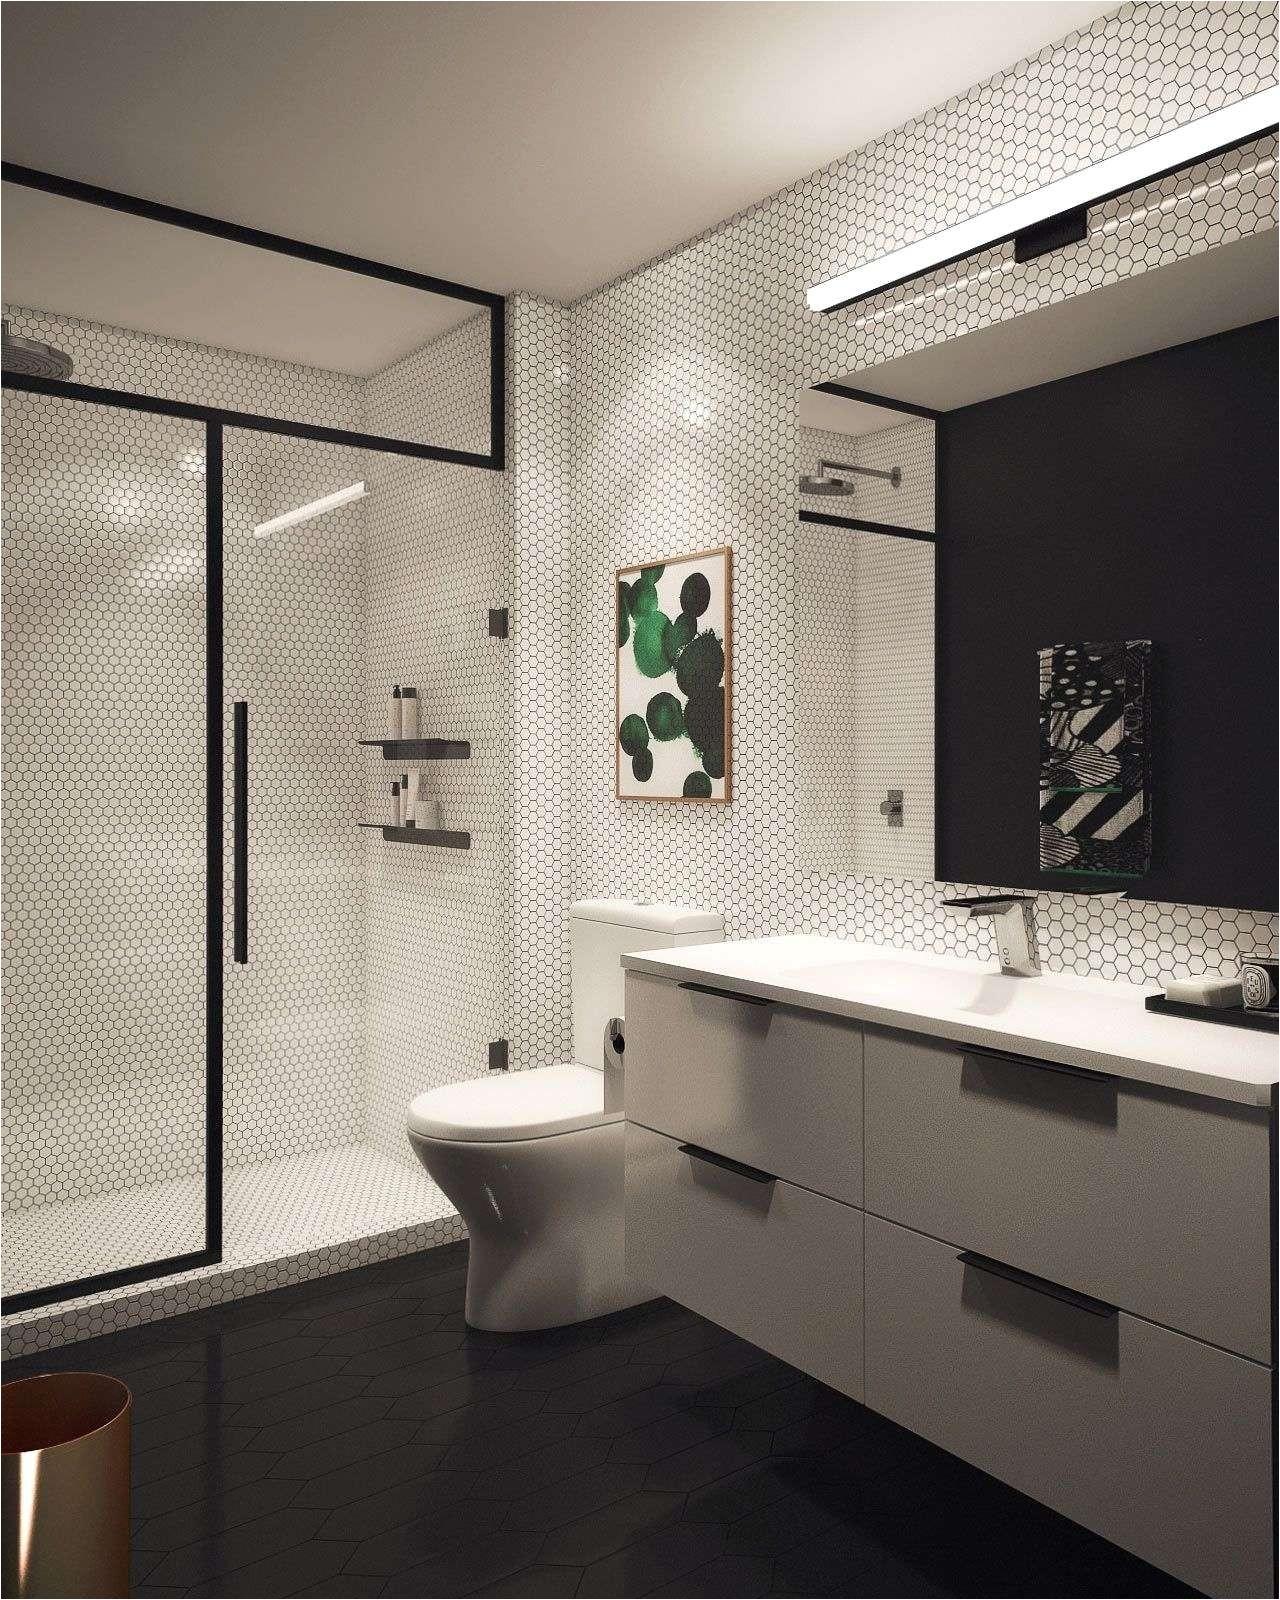 Bathroom Design Ideas for Small Bathrooms Pictures Bathroom Design Ideas for Small Bathrooms Valid Lovely Small